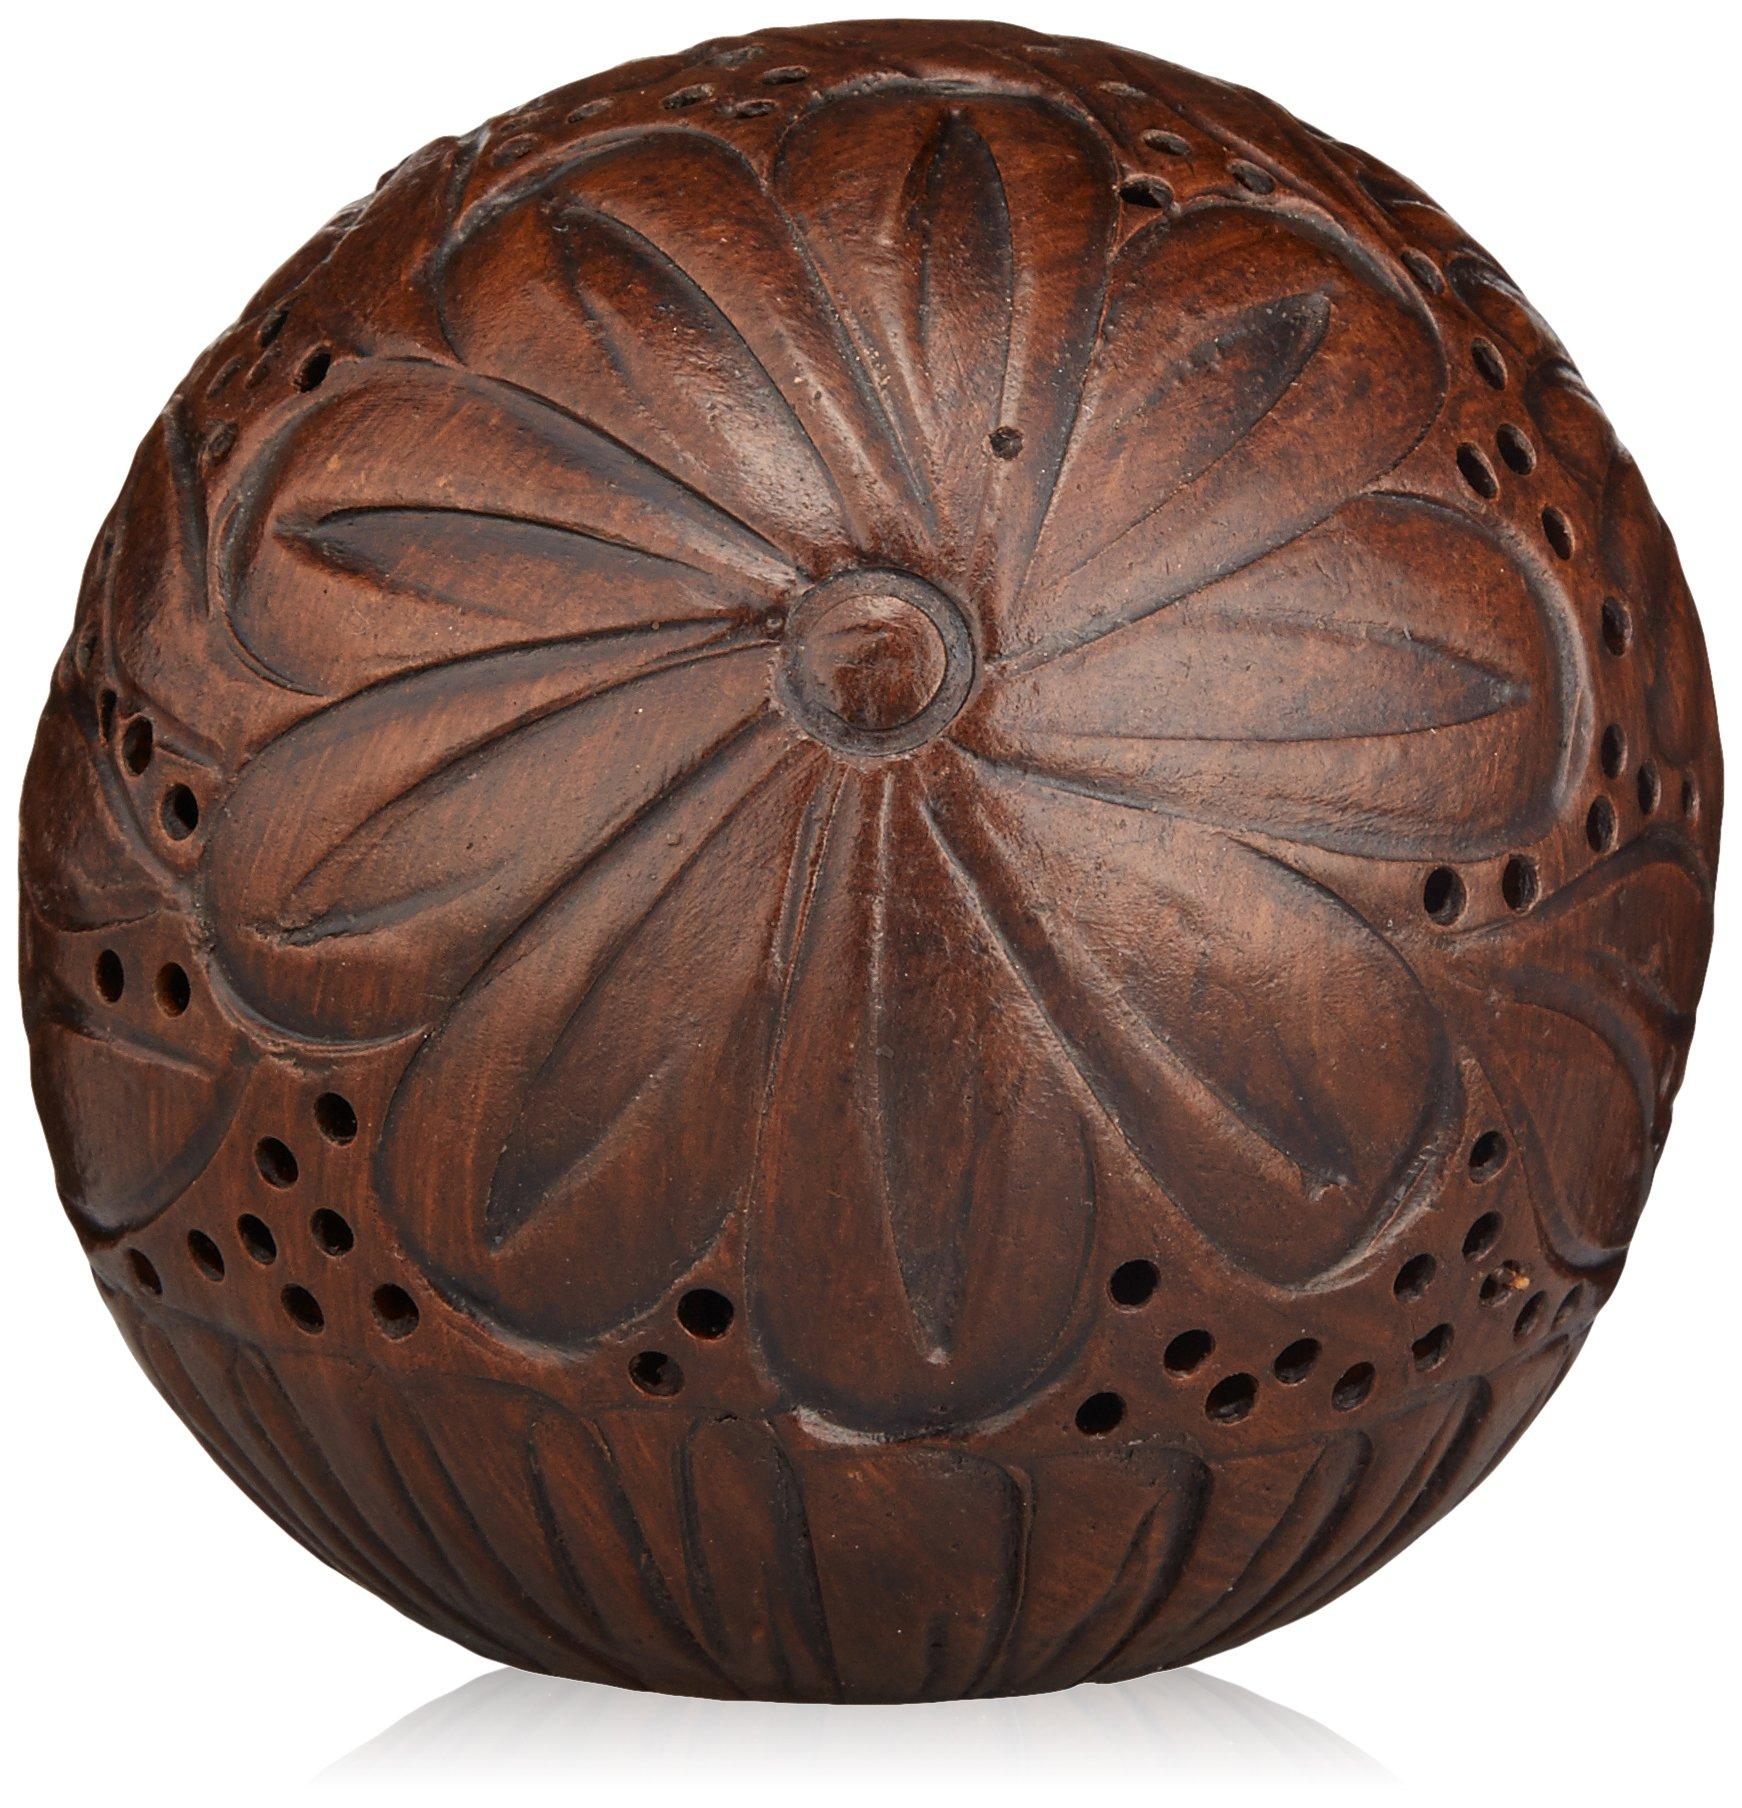 Terracotta Amber Ball by L'Artisan Parfumeur (Diameter: 75mm (2.95 inches) Fill: 20g)